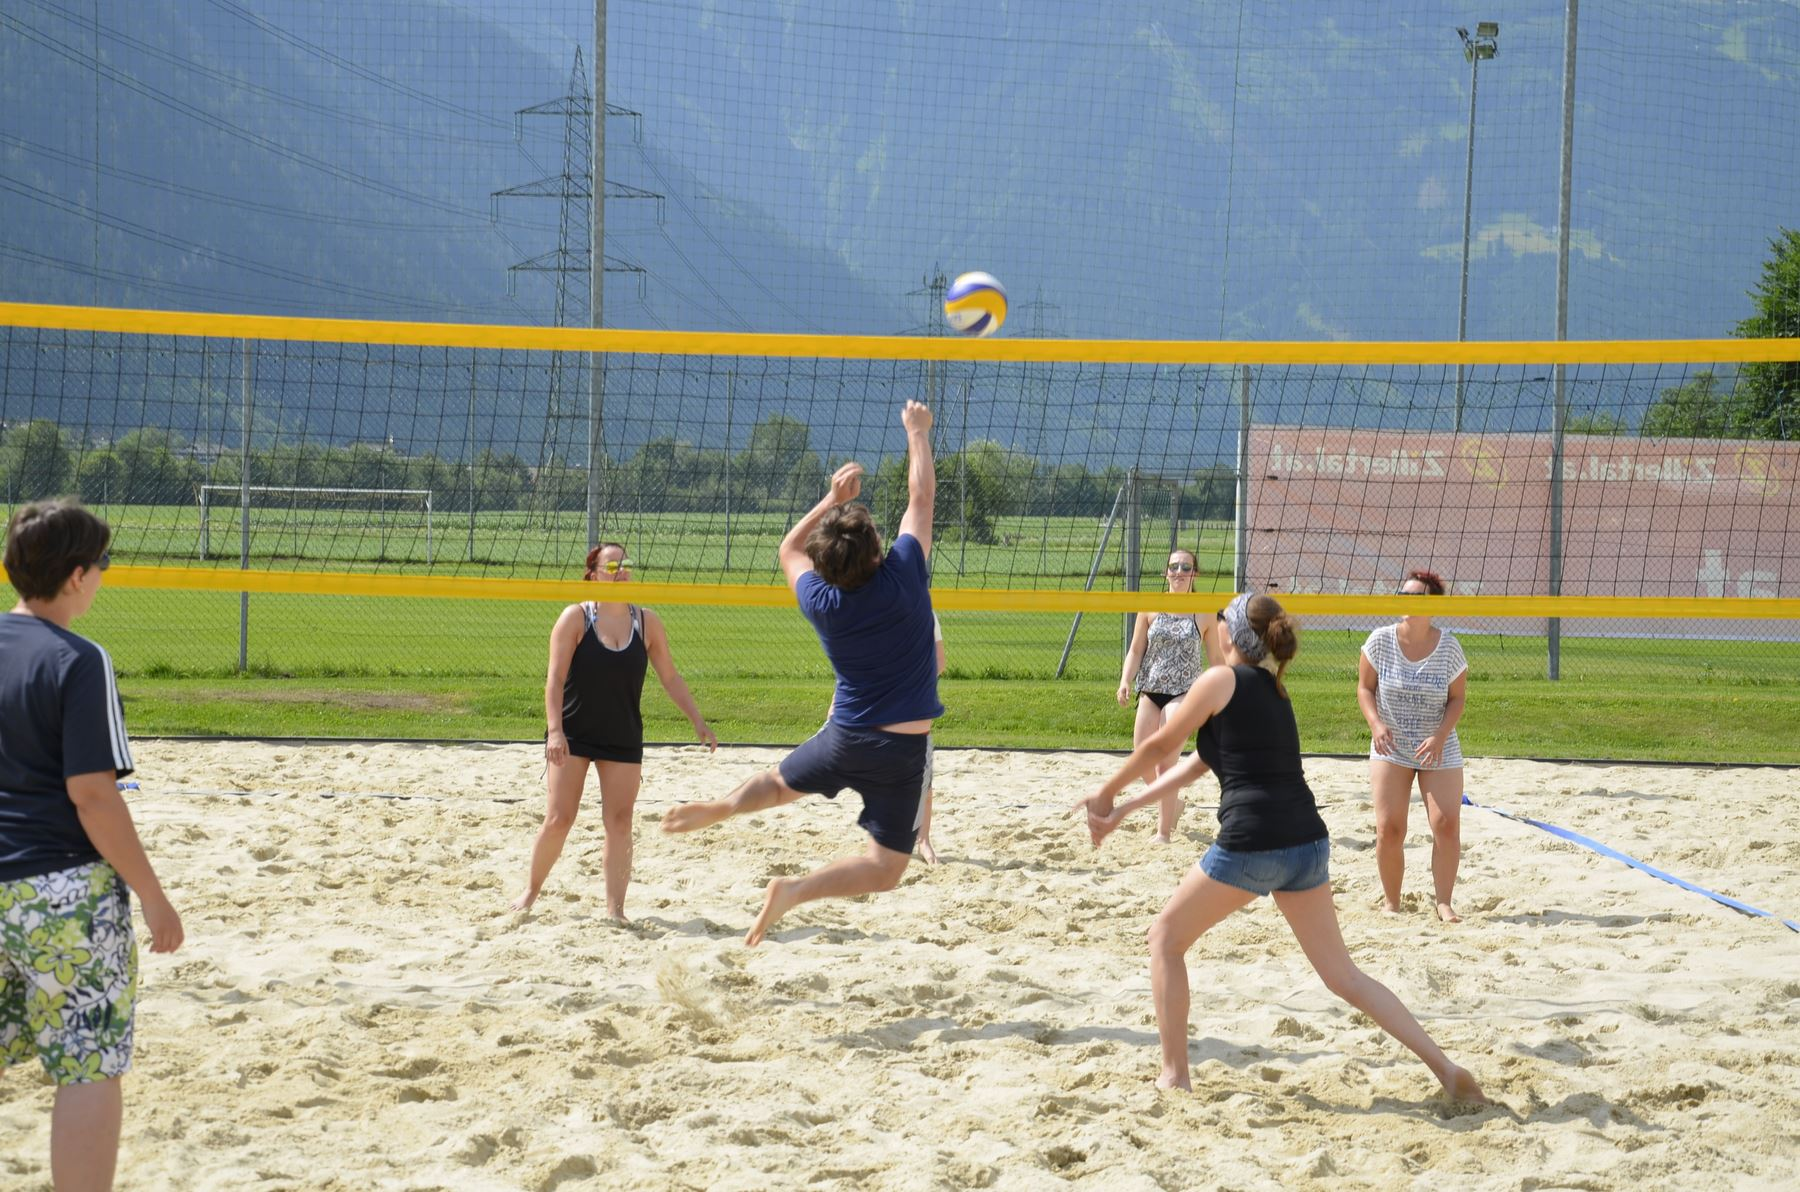 2016-07-02 Beachvolleyball 004